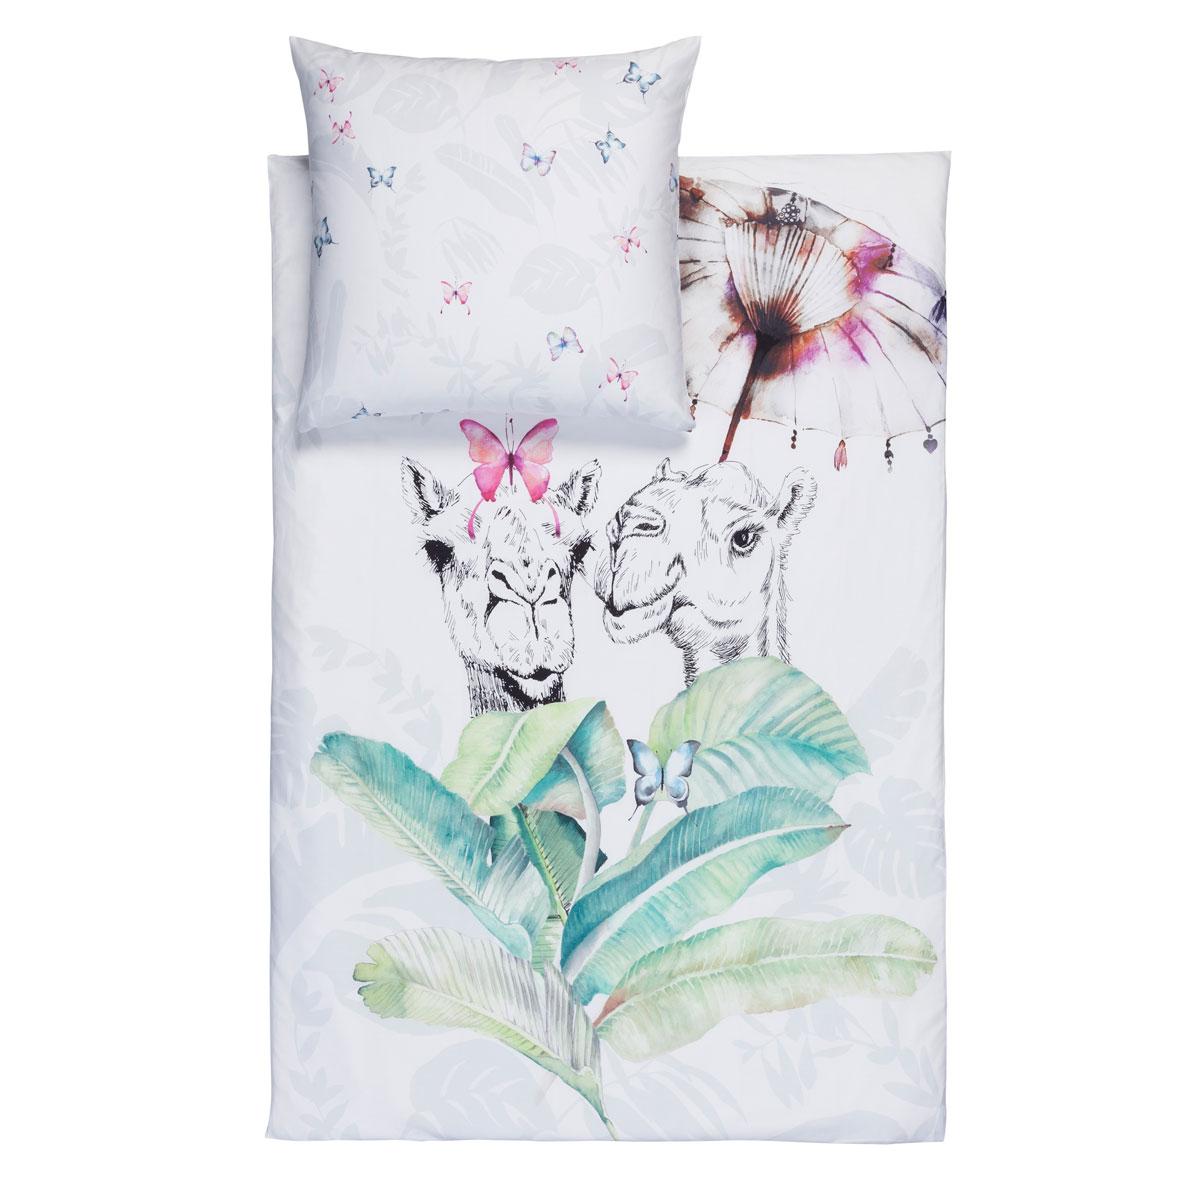 Full Size of Mako Satin Estella Bettwsche Camelie Silber Lustige T Shirt Sprüche T Shirt Bettwäsche Wohnzimmer Lustige Bettwäsche 155x220